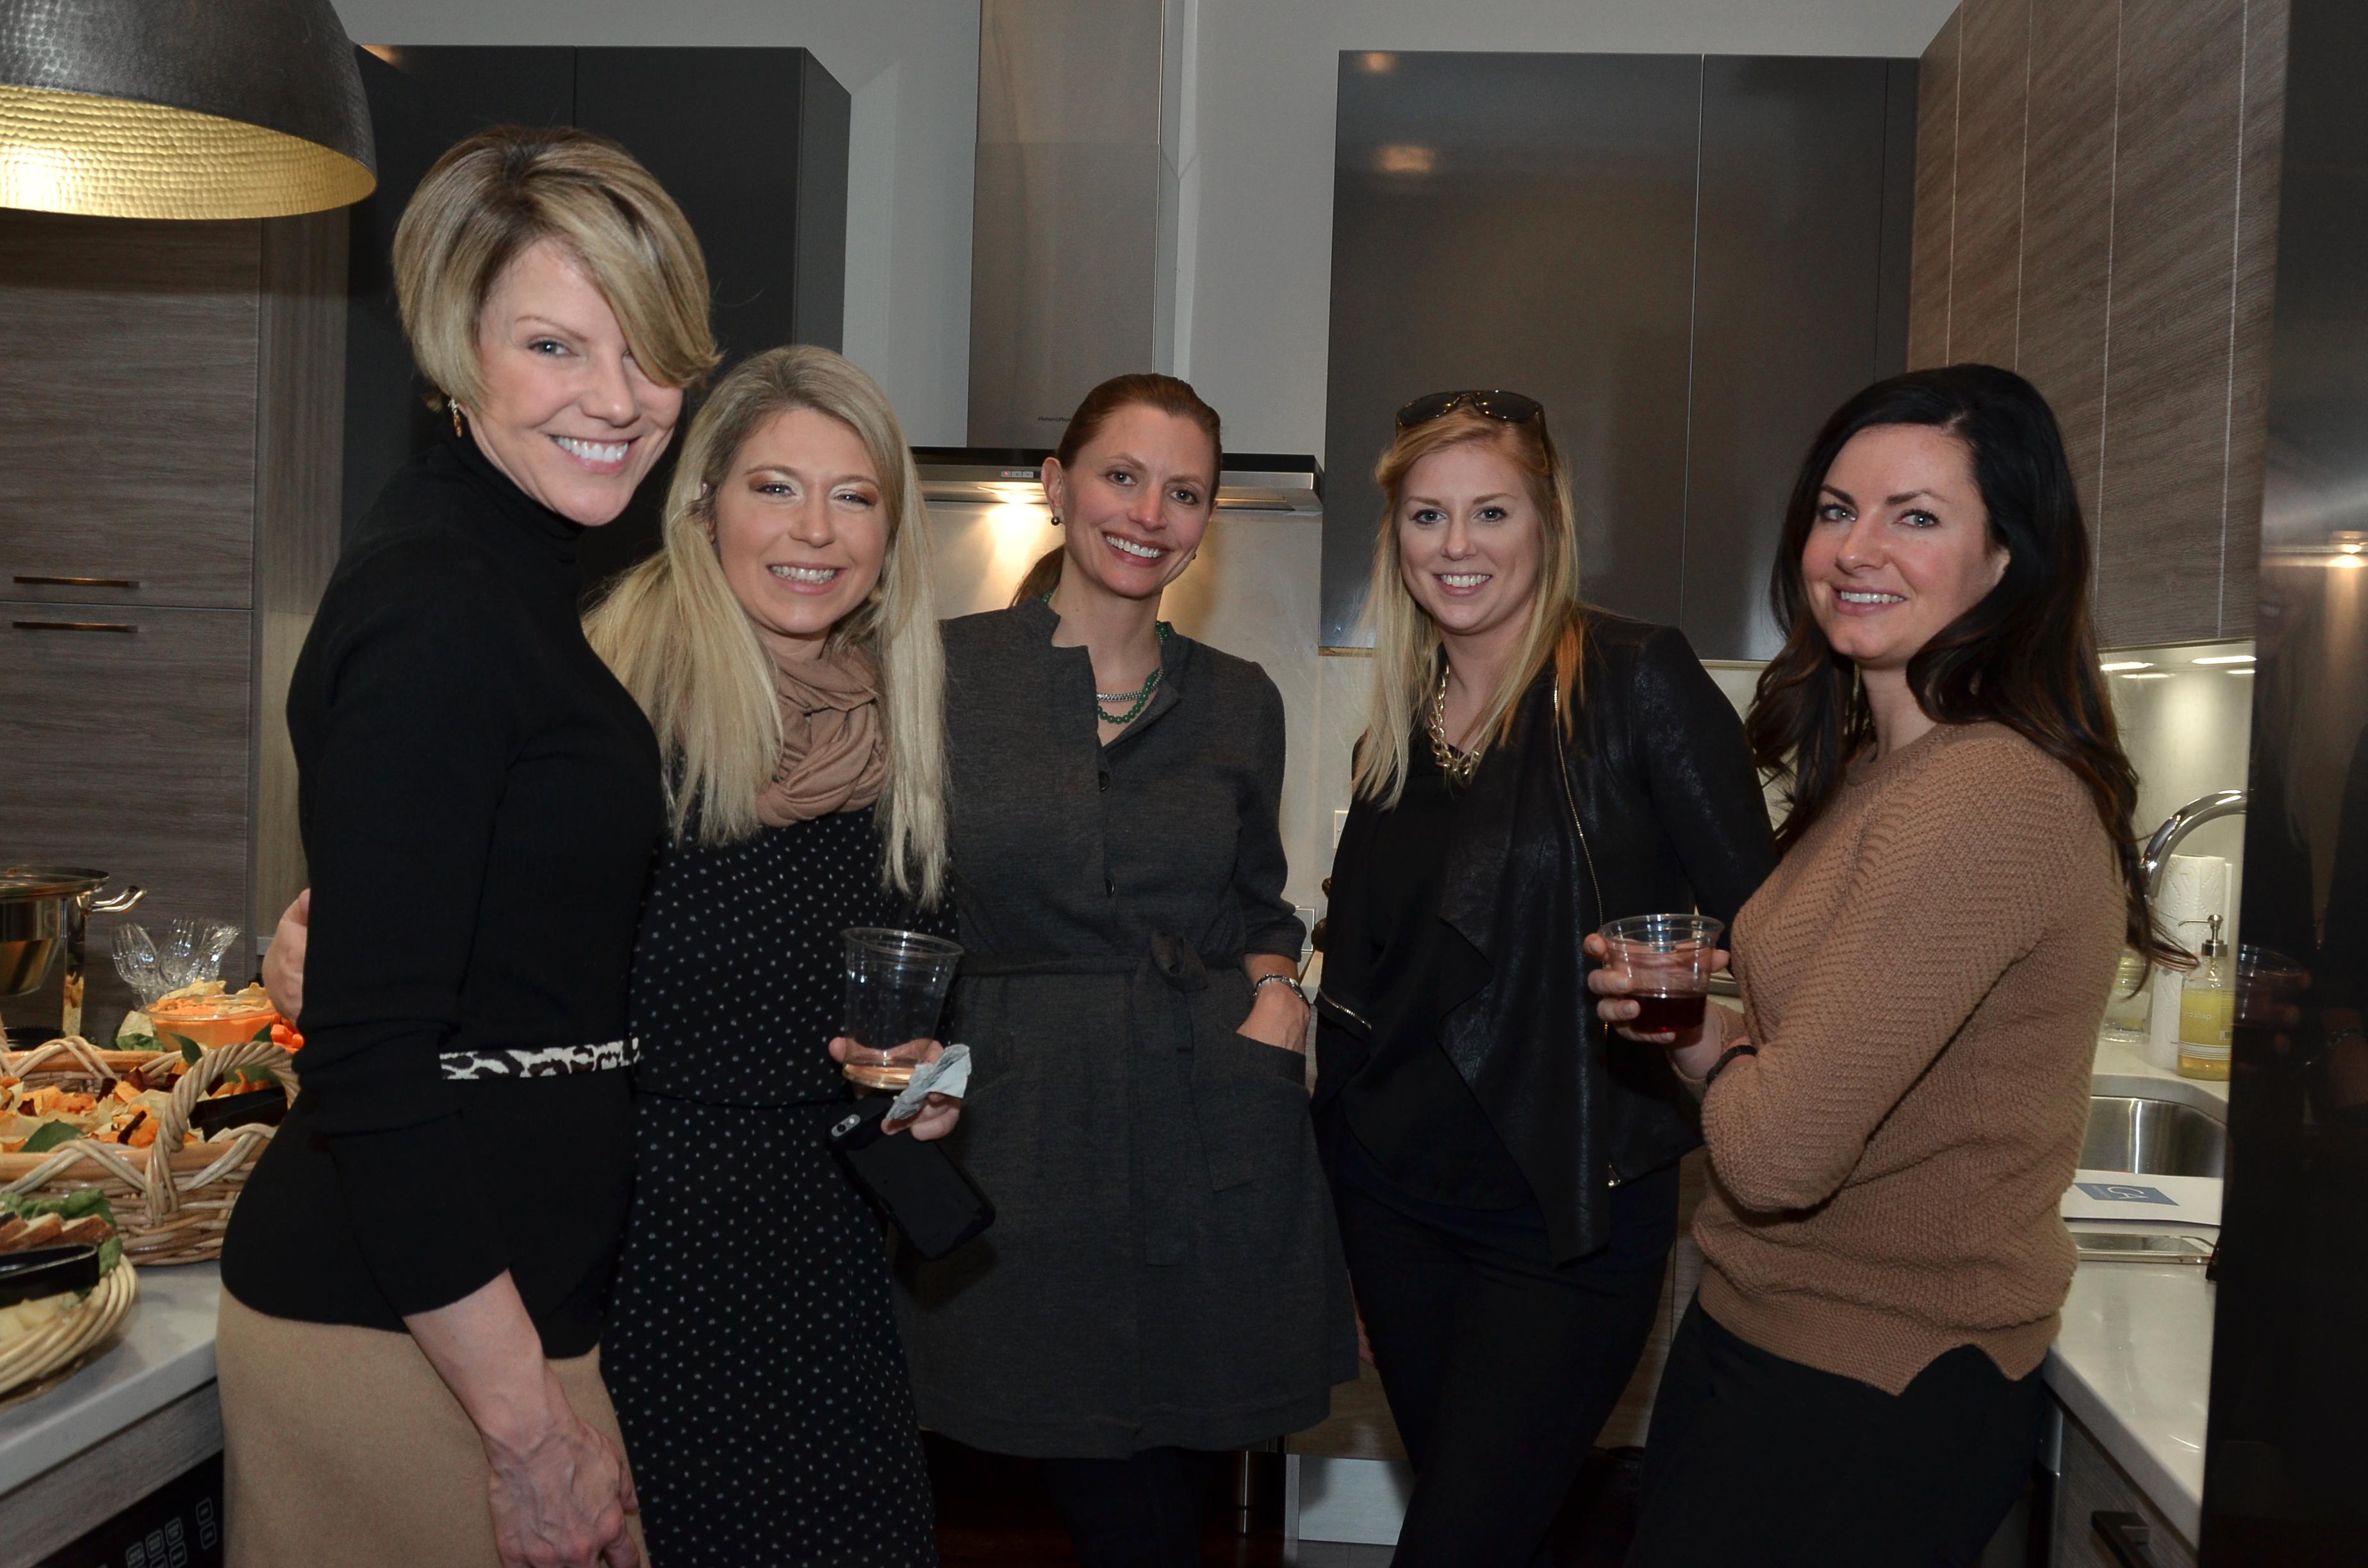 036-Liz-Brooks-Julie-Busby-Pamela-Moran-Abby-Carr-Amanda-Mason-JPG.jpg